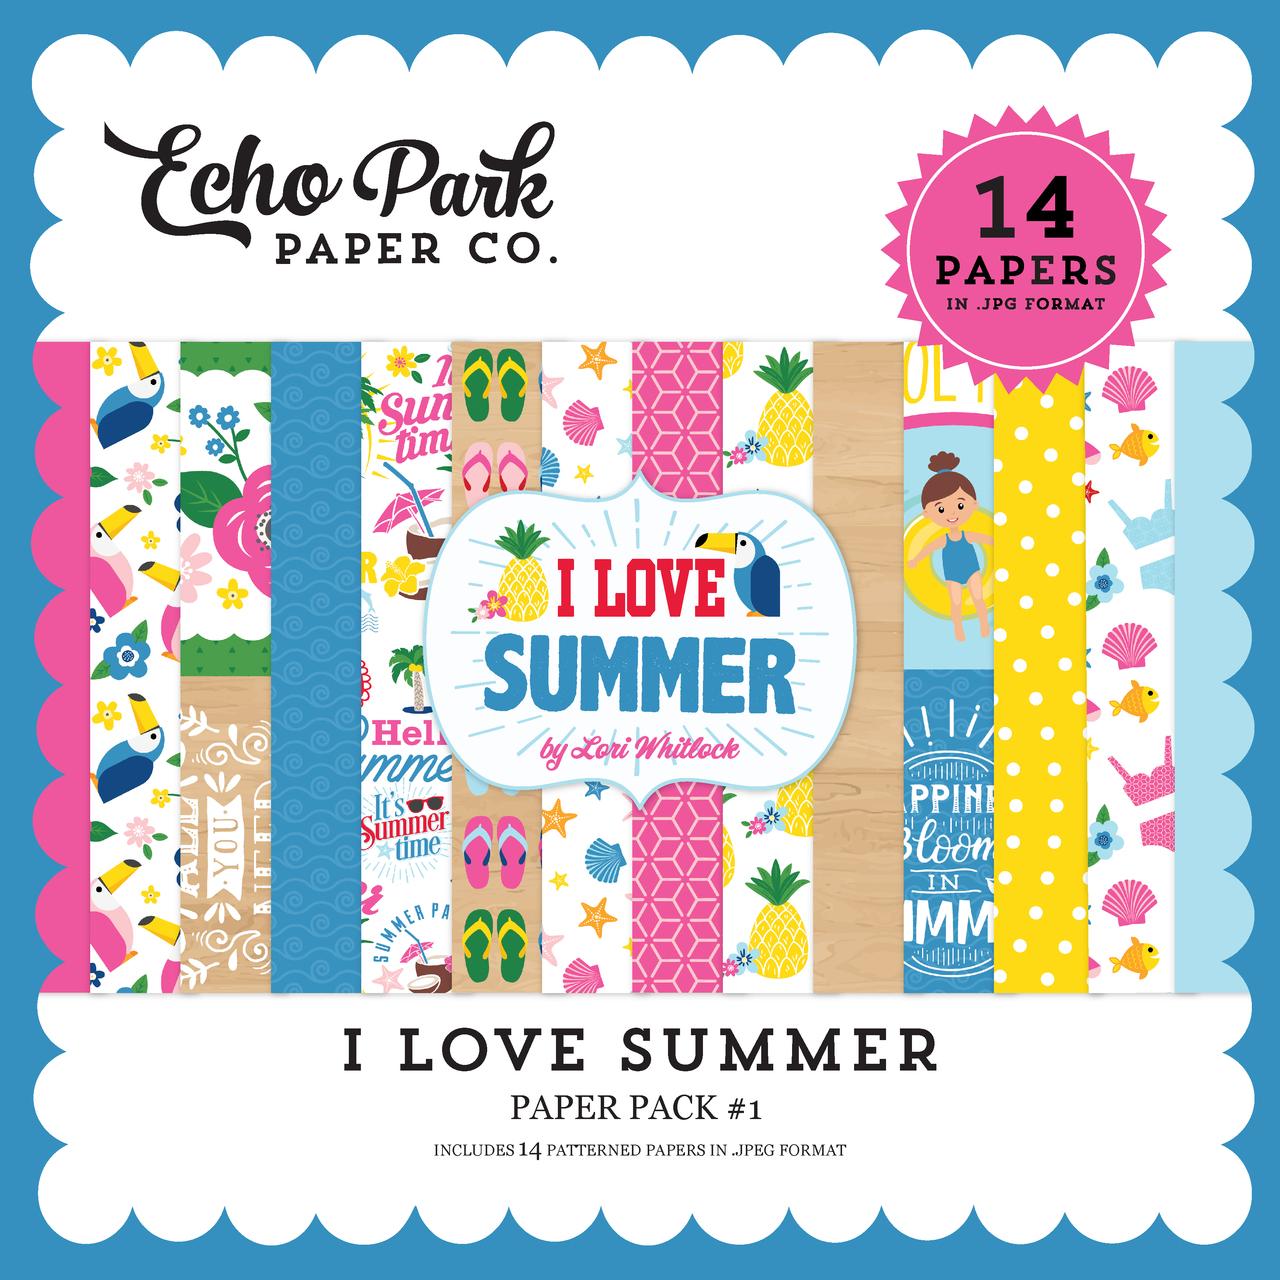 I Love Summer Paper Pack #1